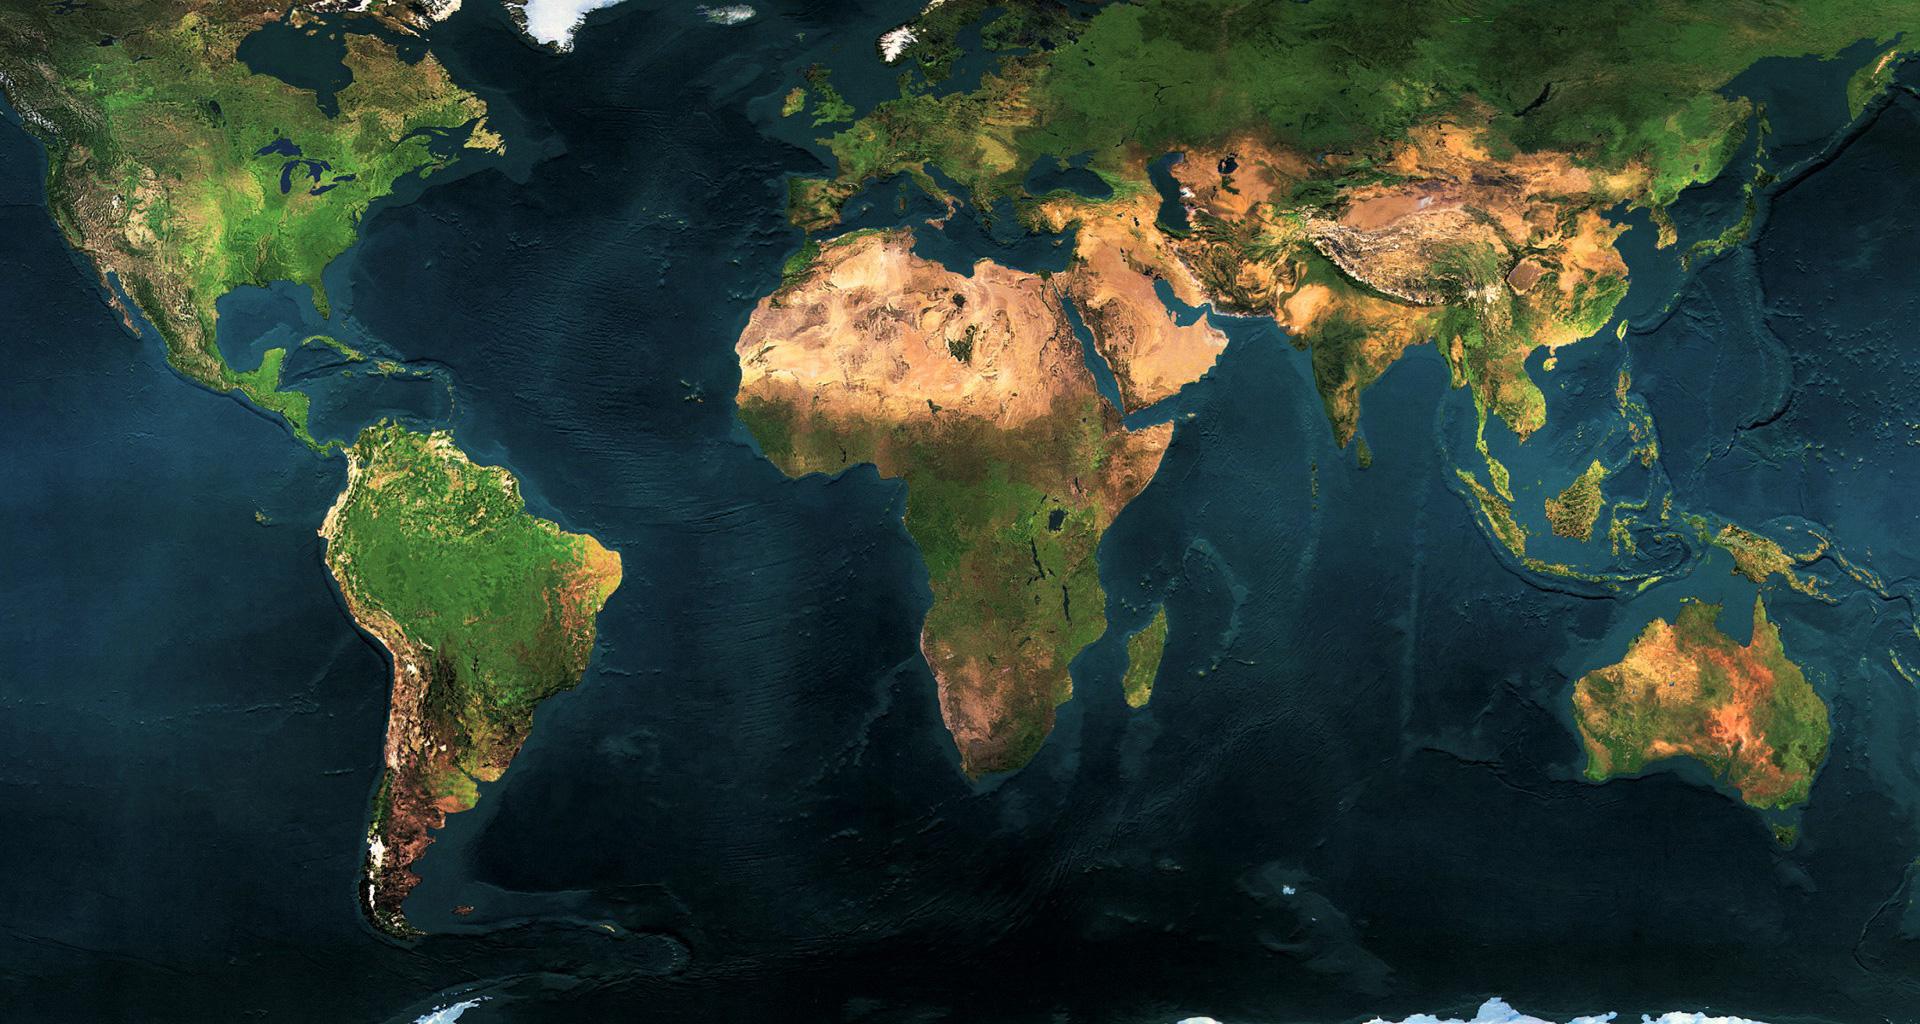 74 World Map Wallpaper High Resolution On Wallpapersafari